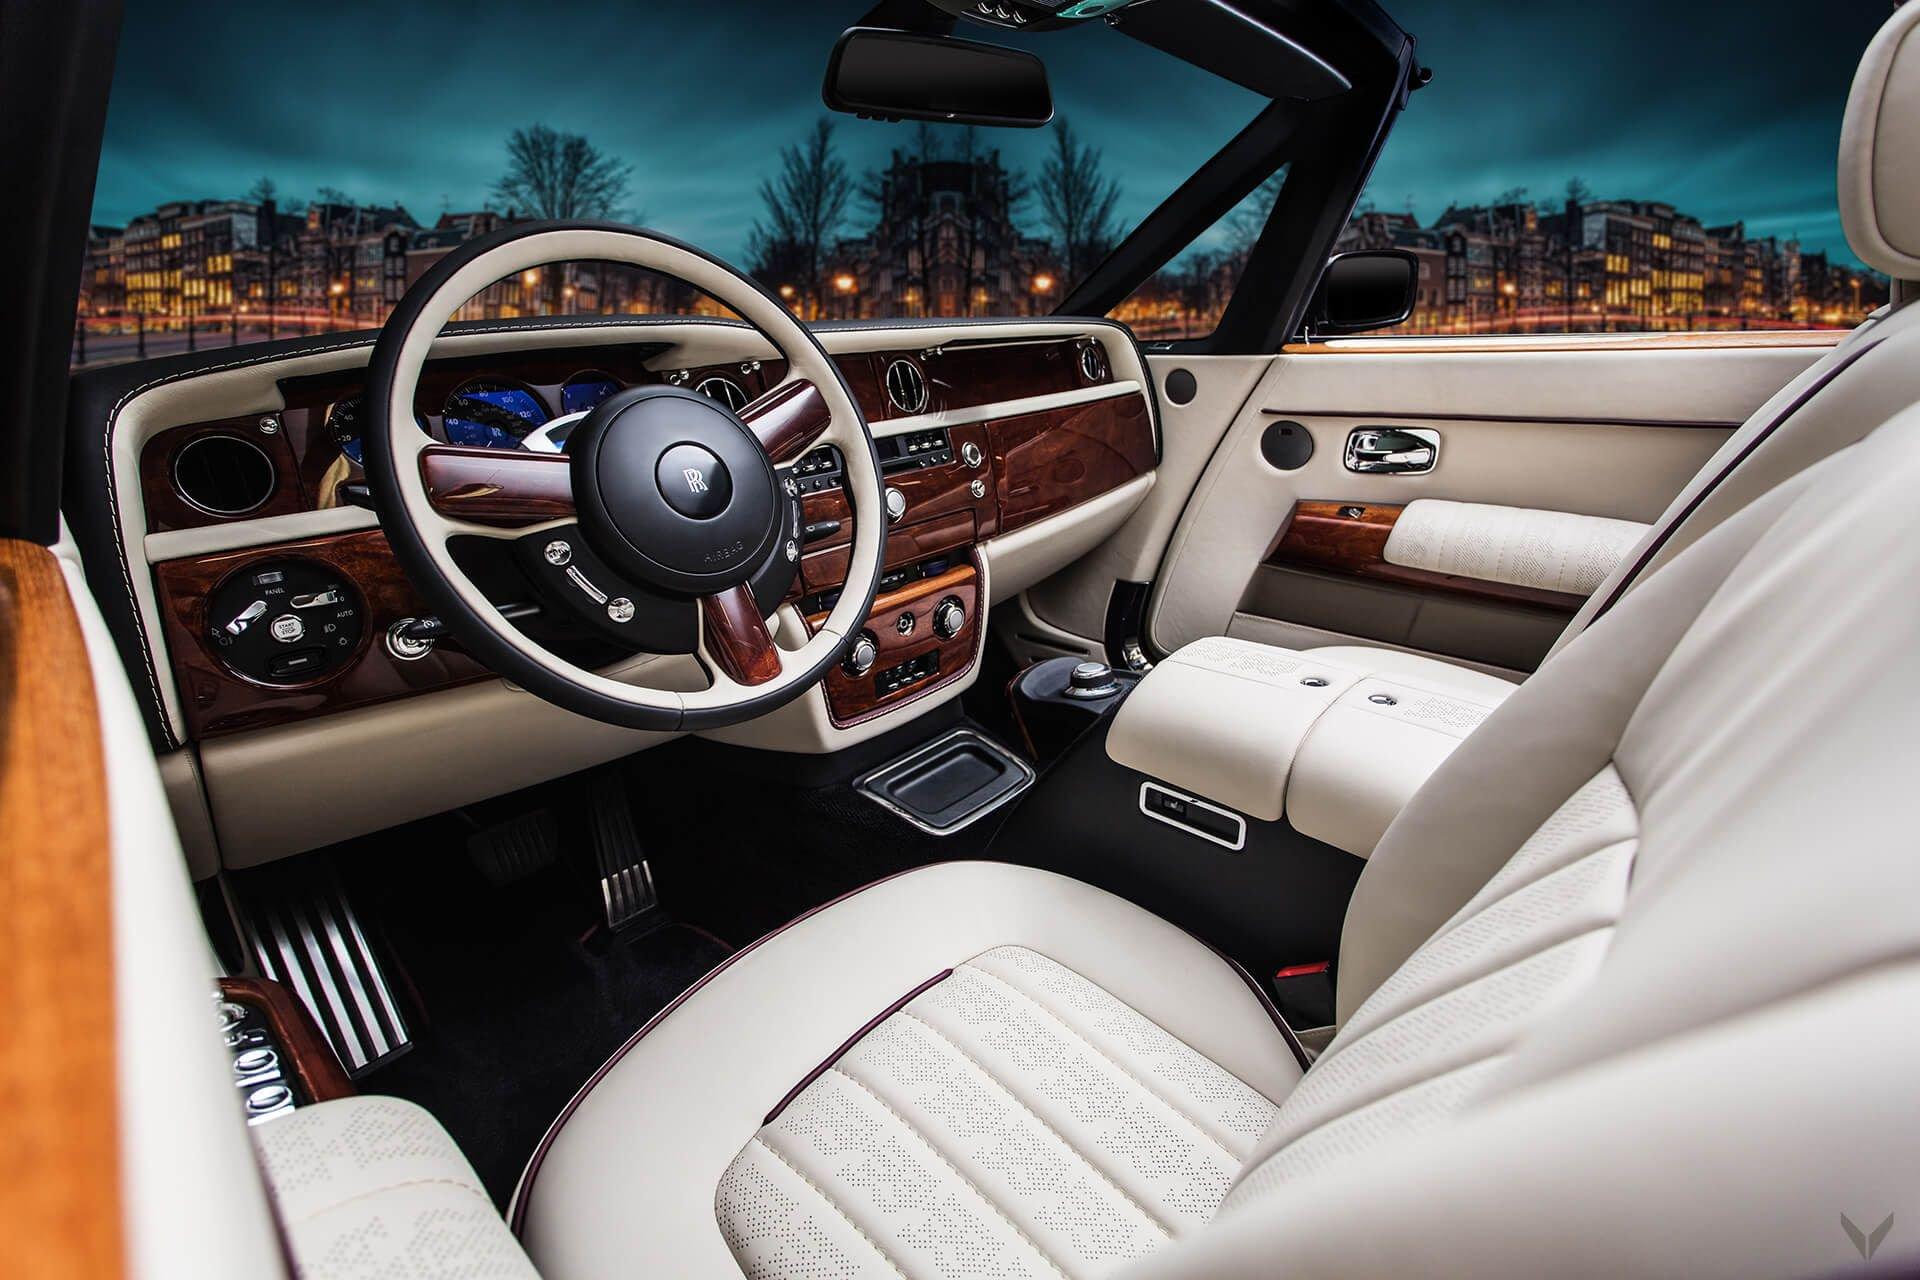 Rolls-Royce_Phantom_Drophead_Coupe_By_Vilner_0003